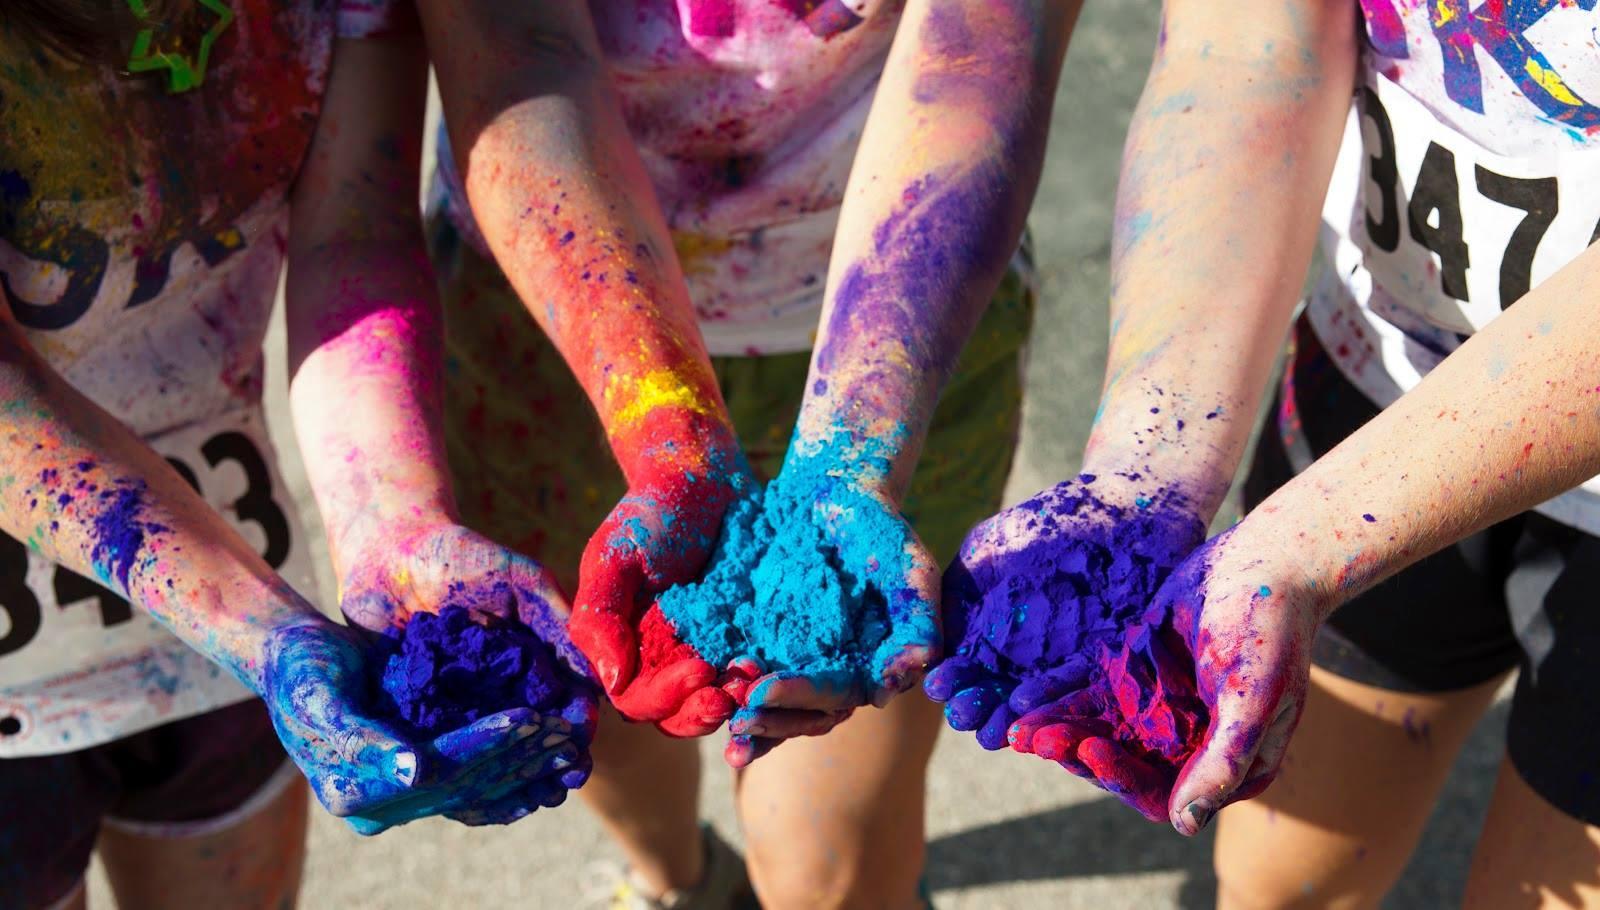 3rd annual fiji color run for cystic fibrosis - Cystic Fibrosis Color